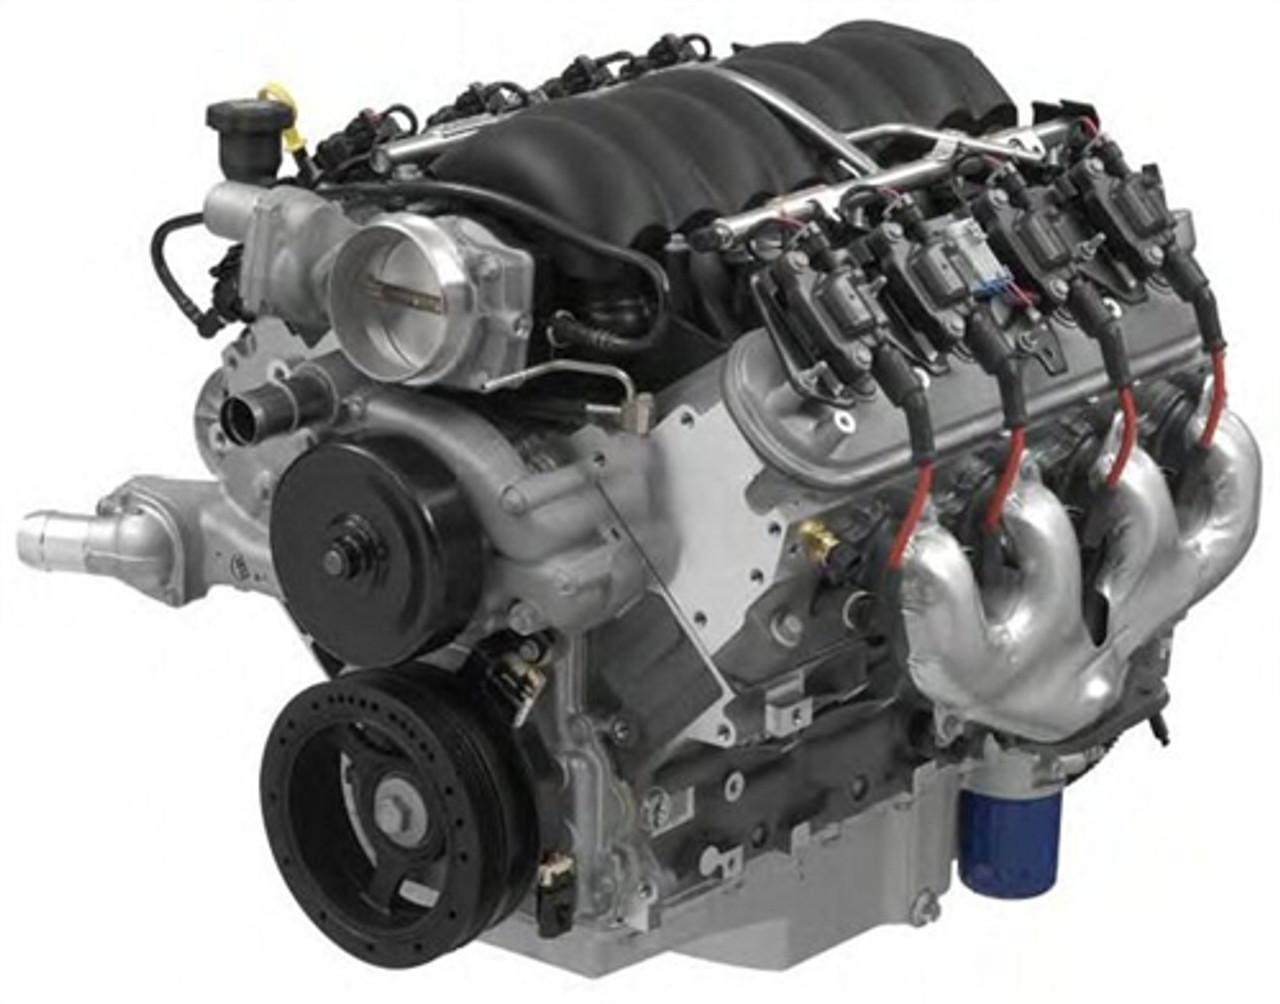 376 CI | 6 2 LSX Engine | 480HP